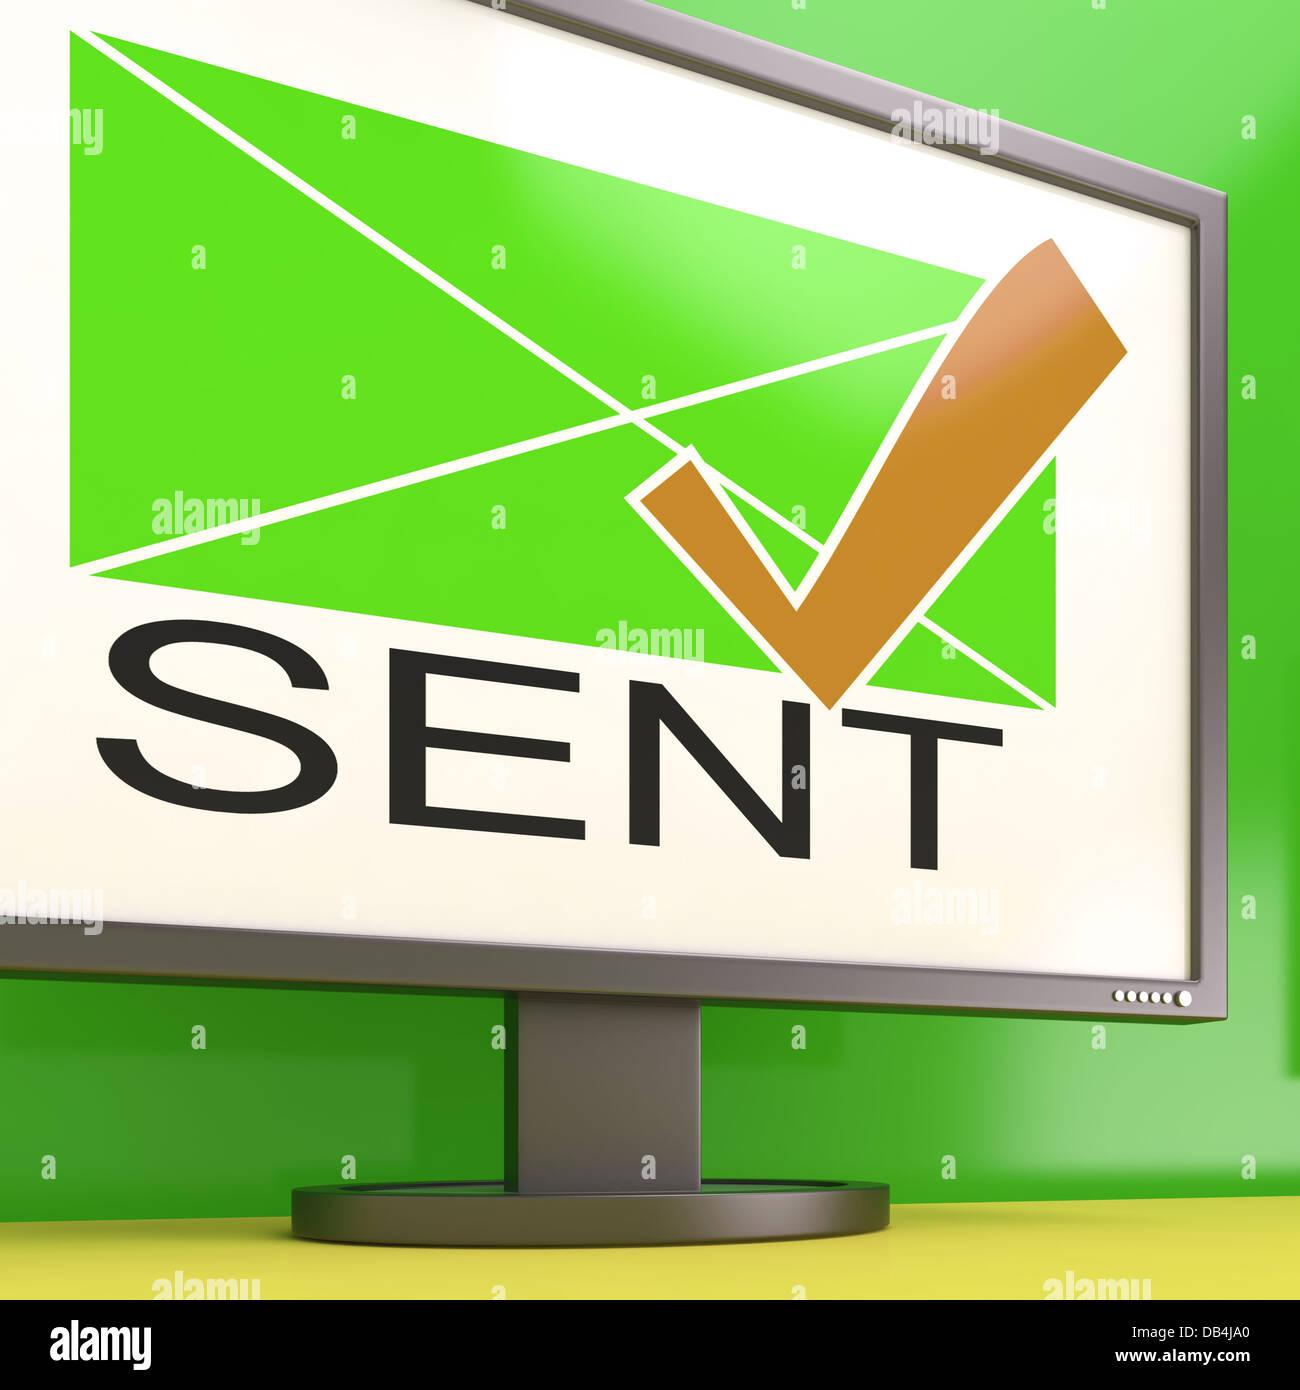 Sent Envelope On Monitor Showing Delivered Messages - Stock Image